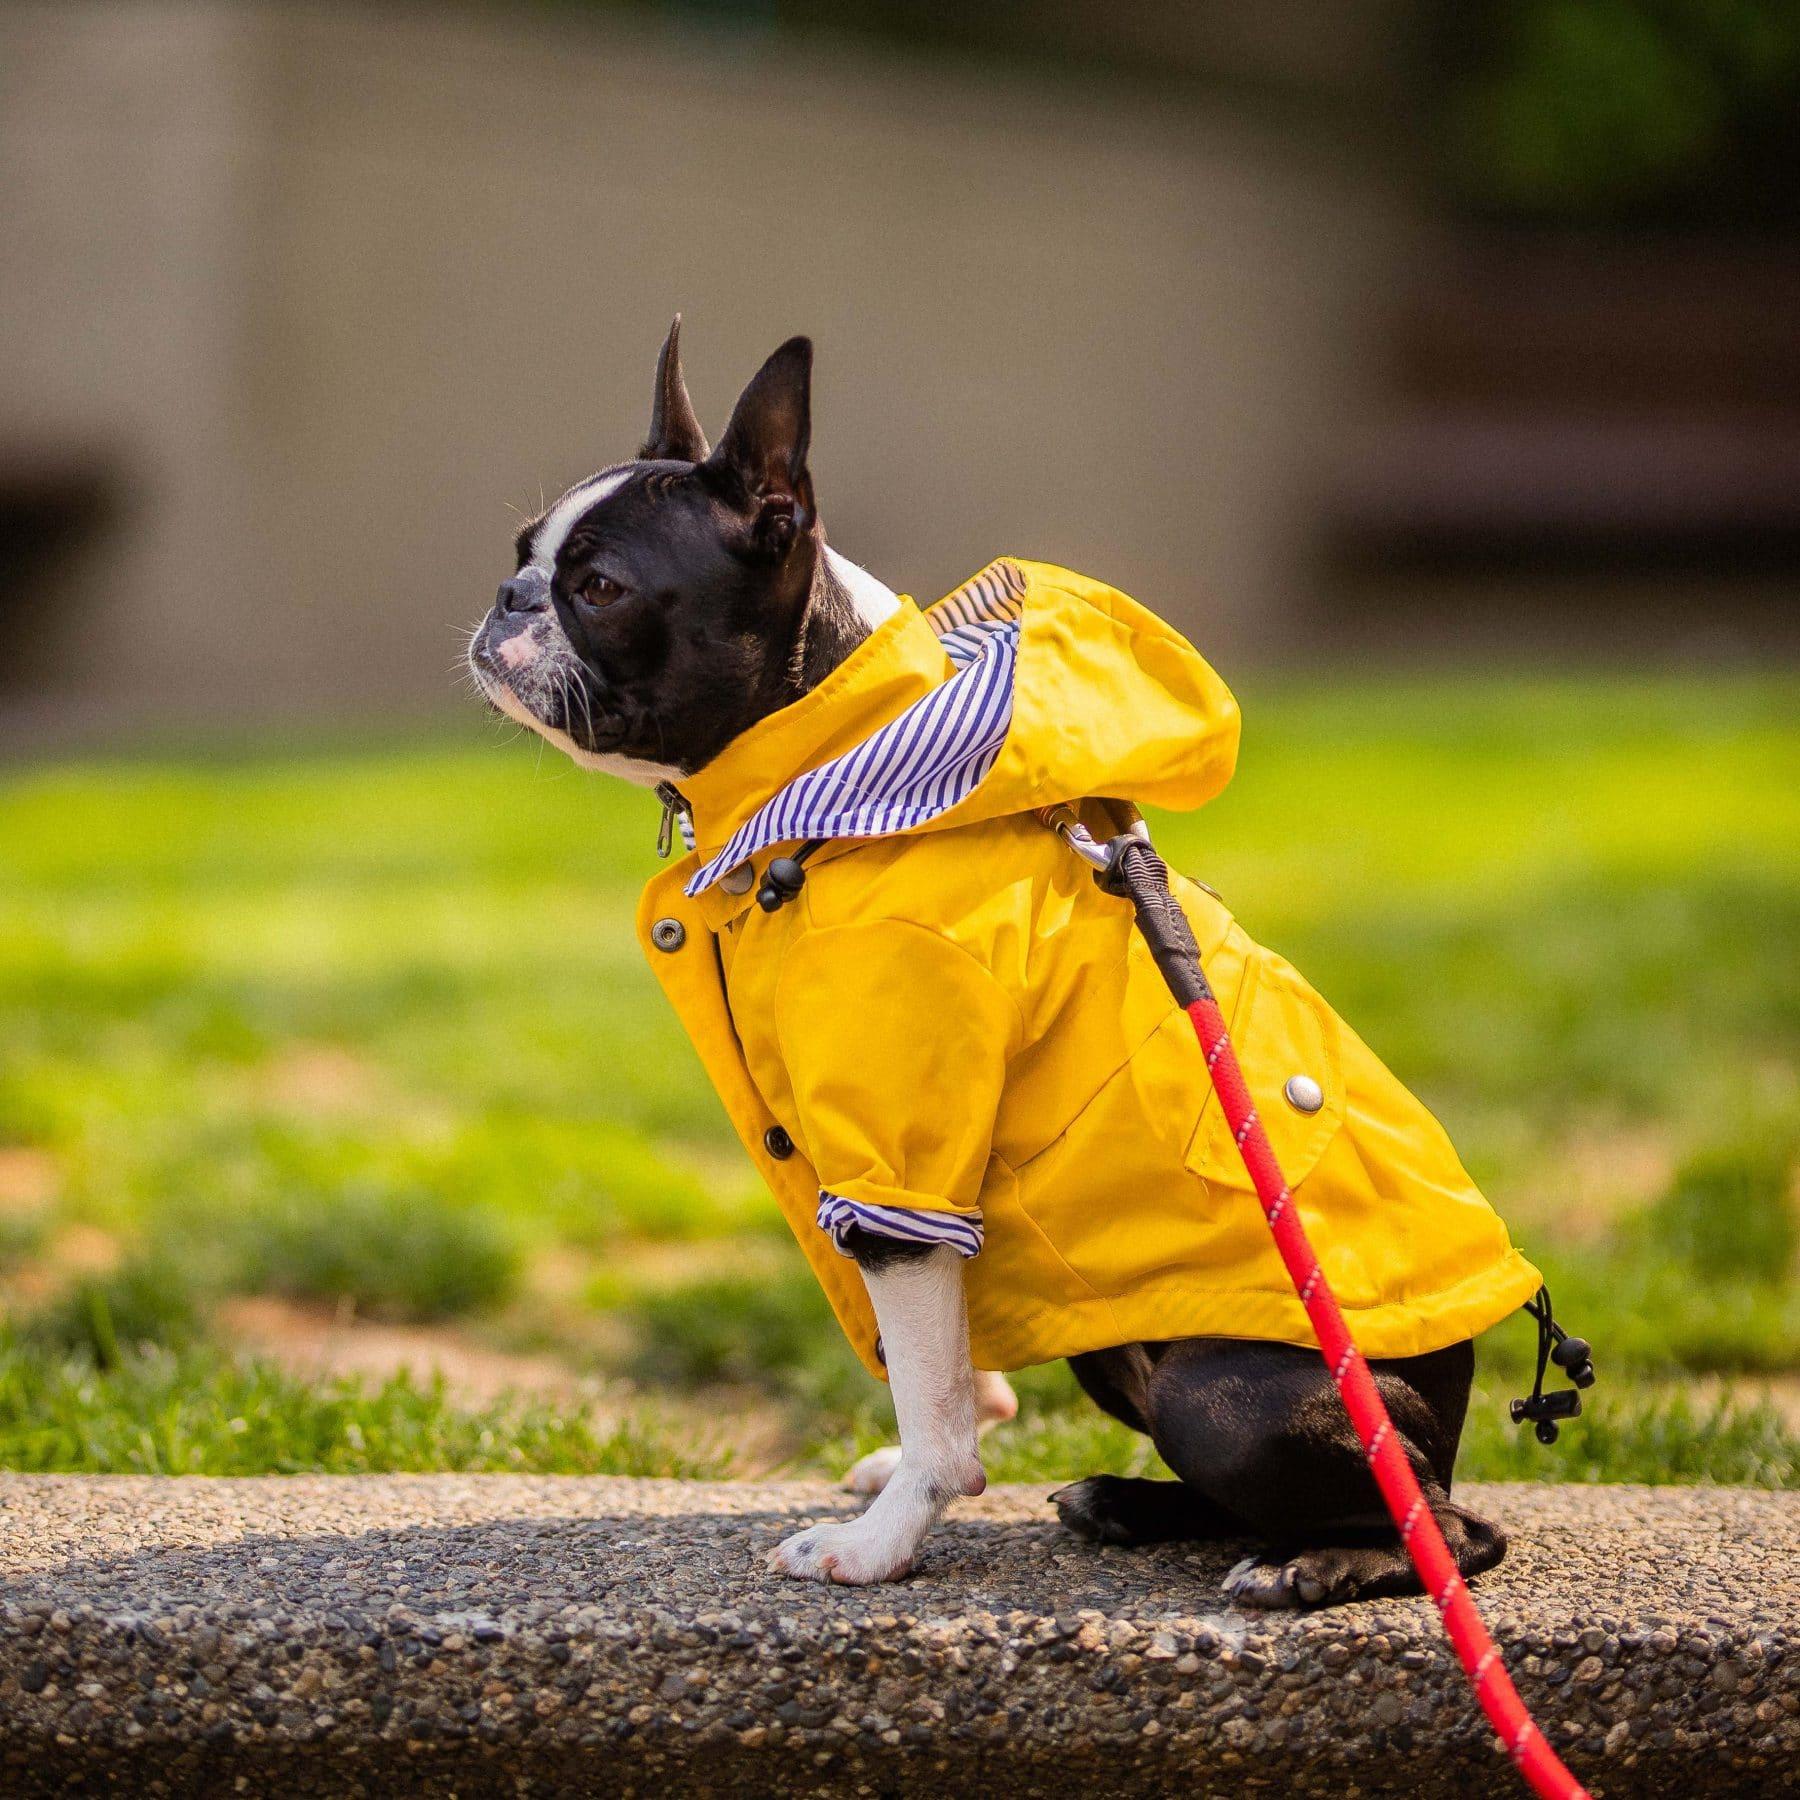 A Boston terrier sits wearing a dog rain slicker